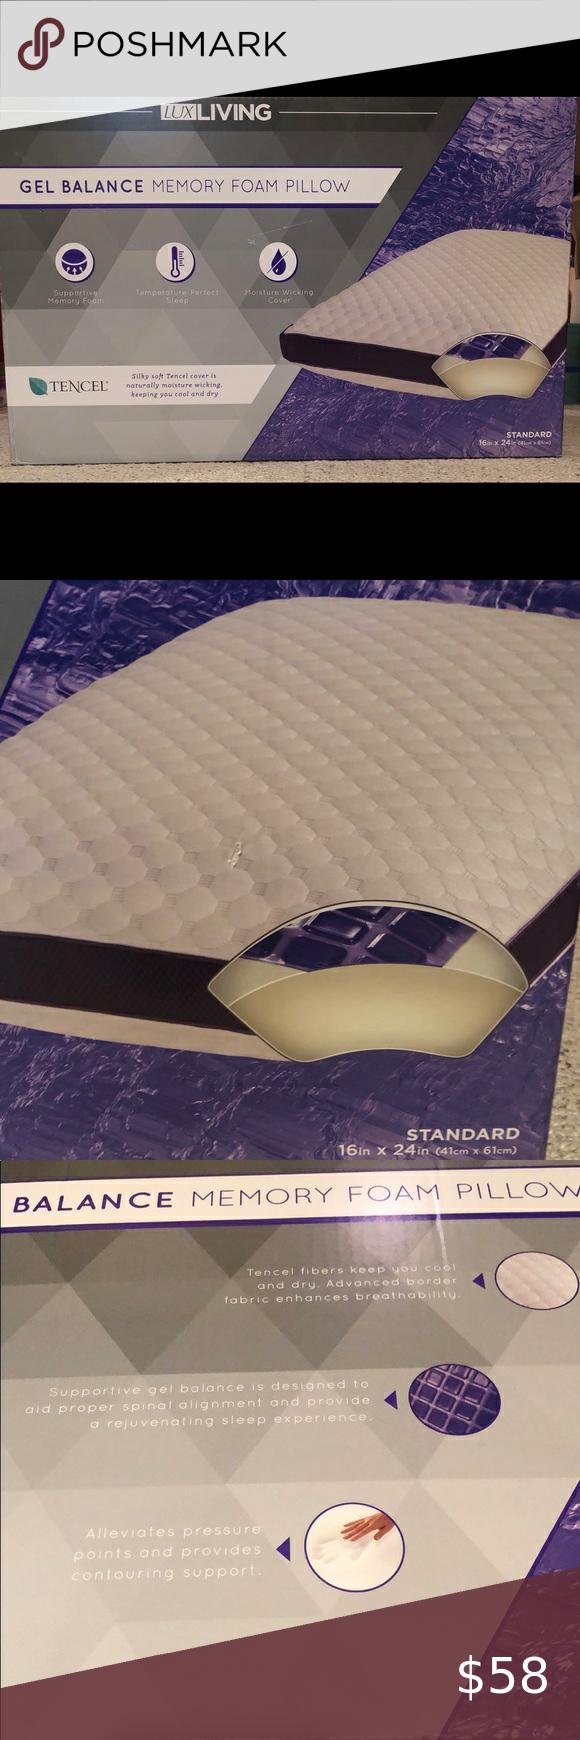 Lux Living Gel Balance Memory Foam Pillow Nwt In 2020 Memory Foam Pillow Foam Pillows Memory Foam